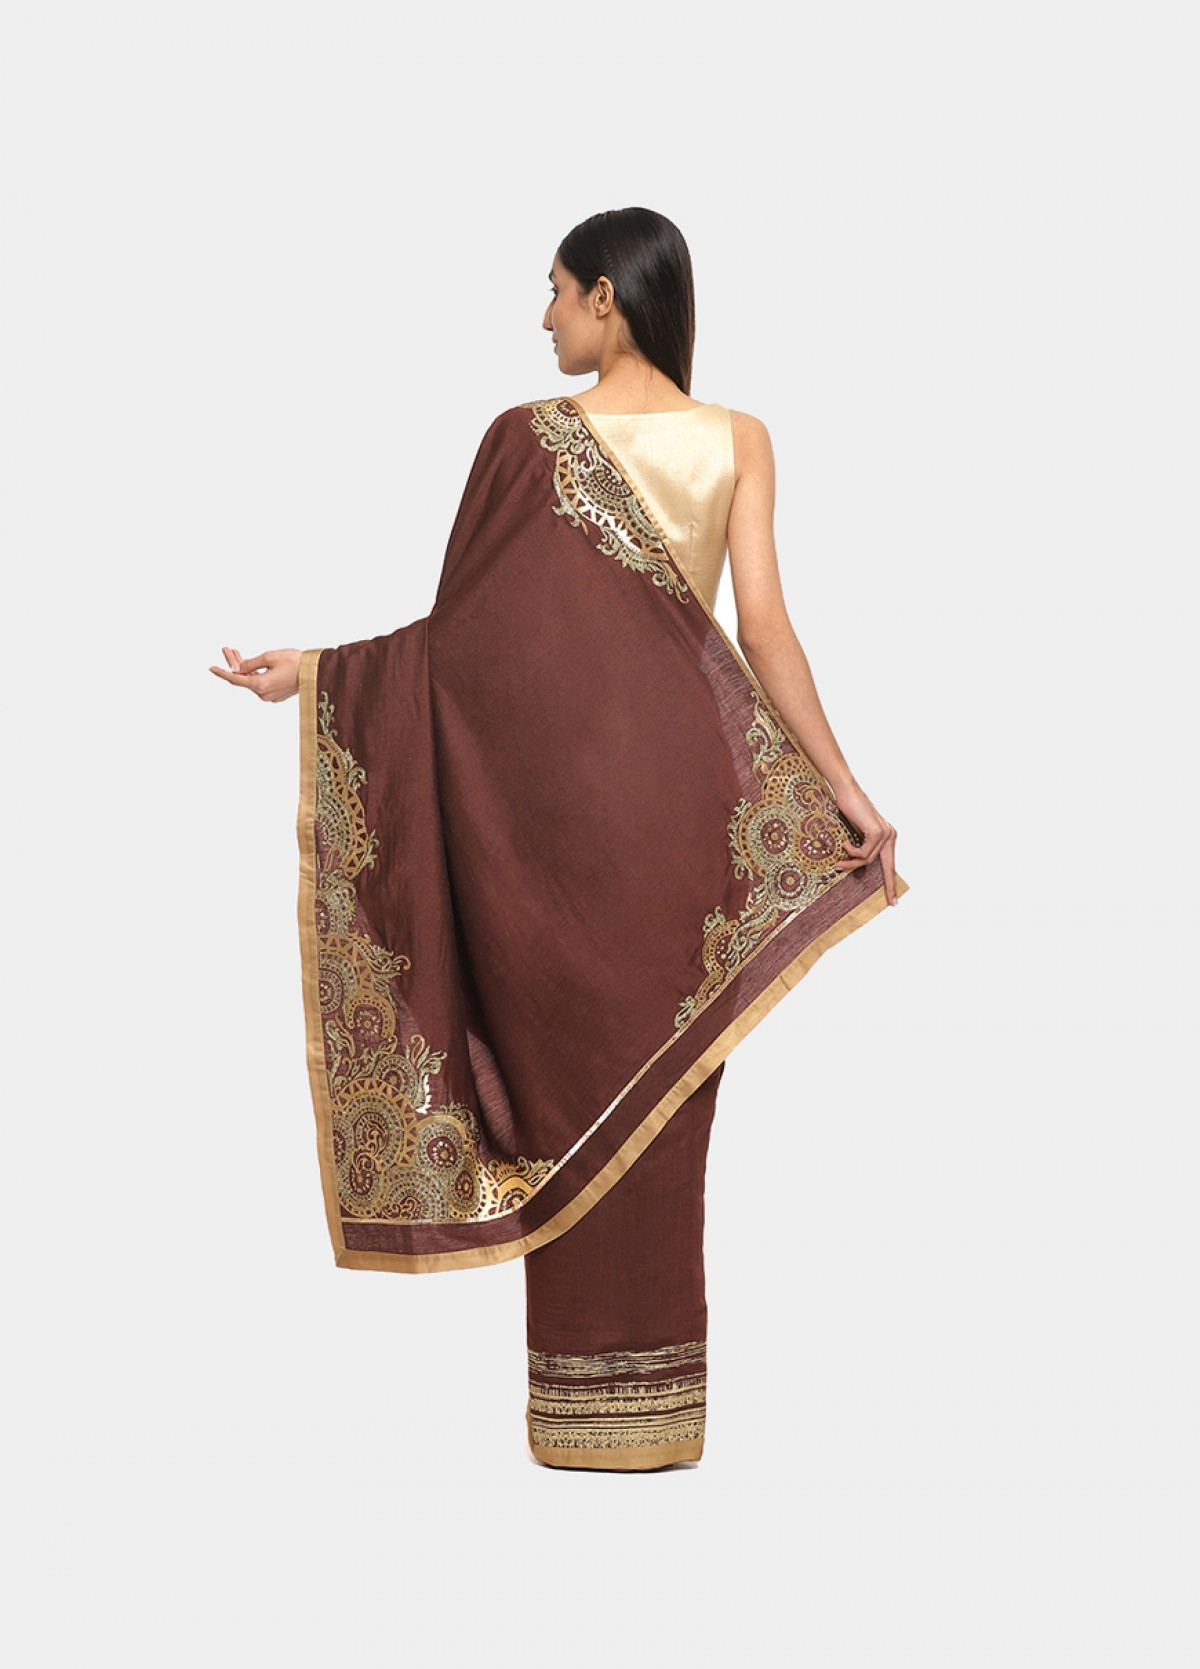 The Silk Brown Embroidered Sari